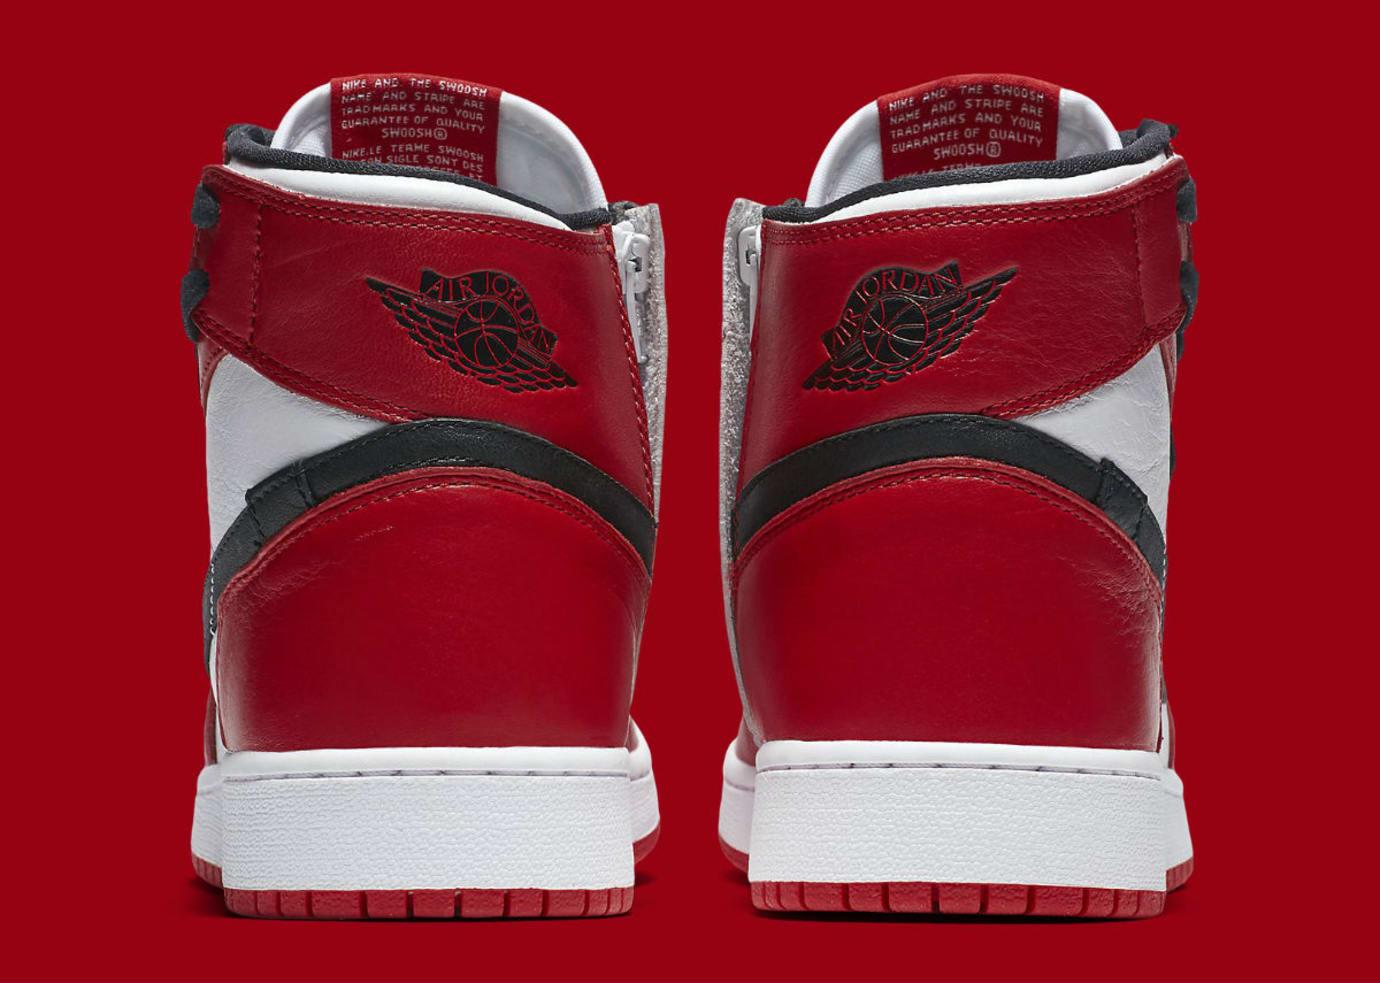 Air Jordan 1 I Rebel XX Chicago Release Date AT4151-100 Heel